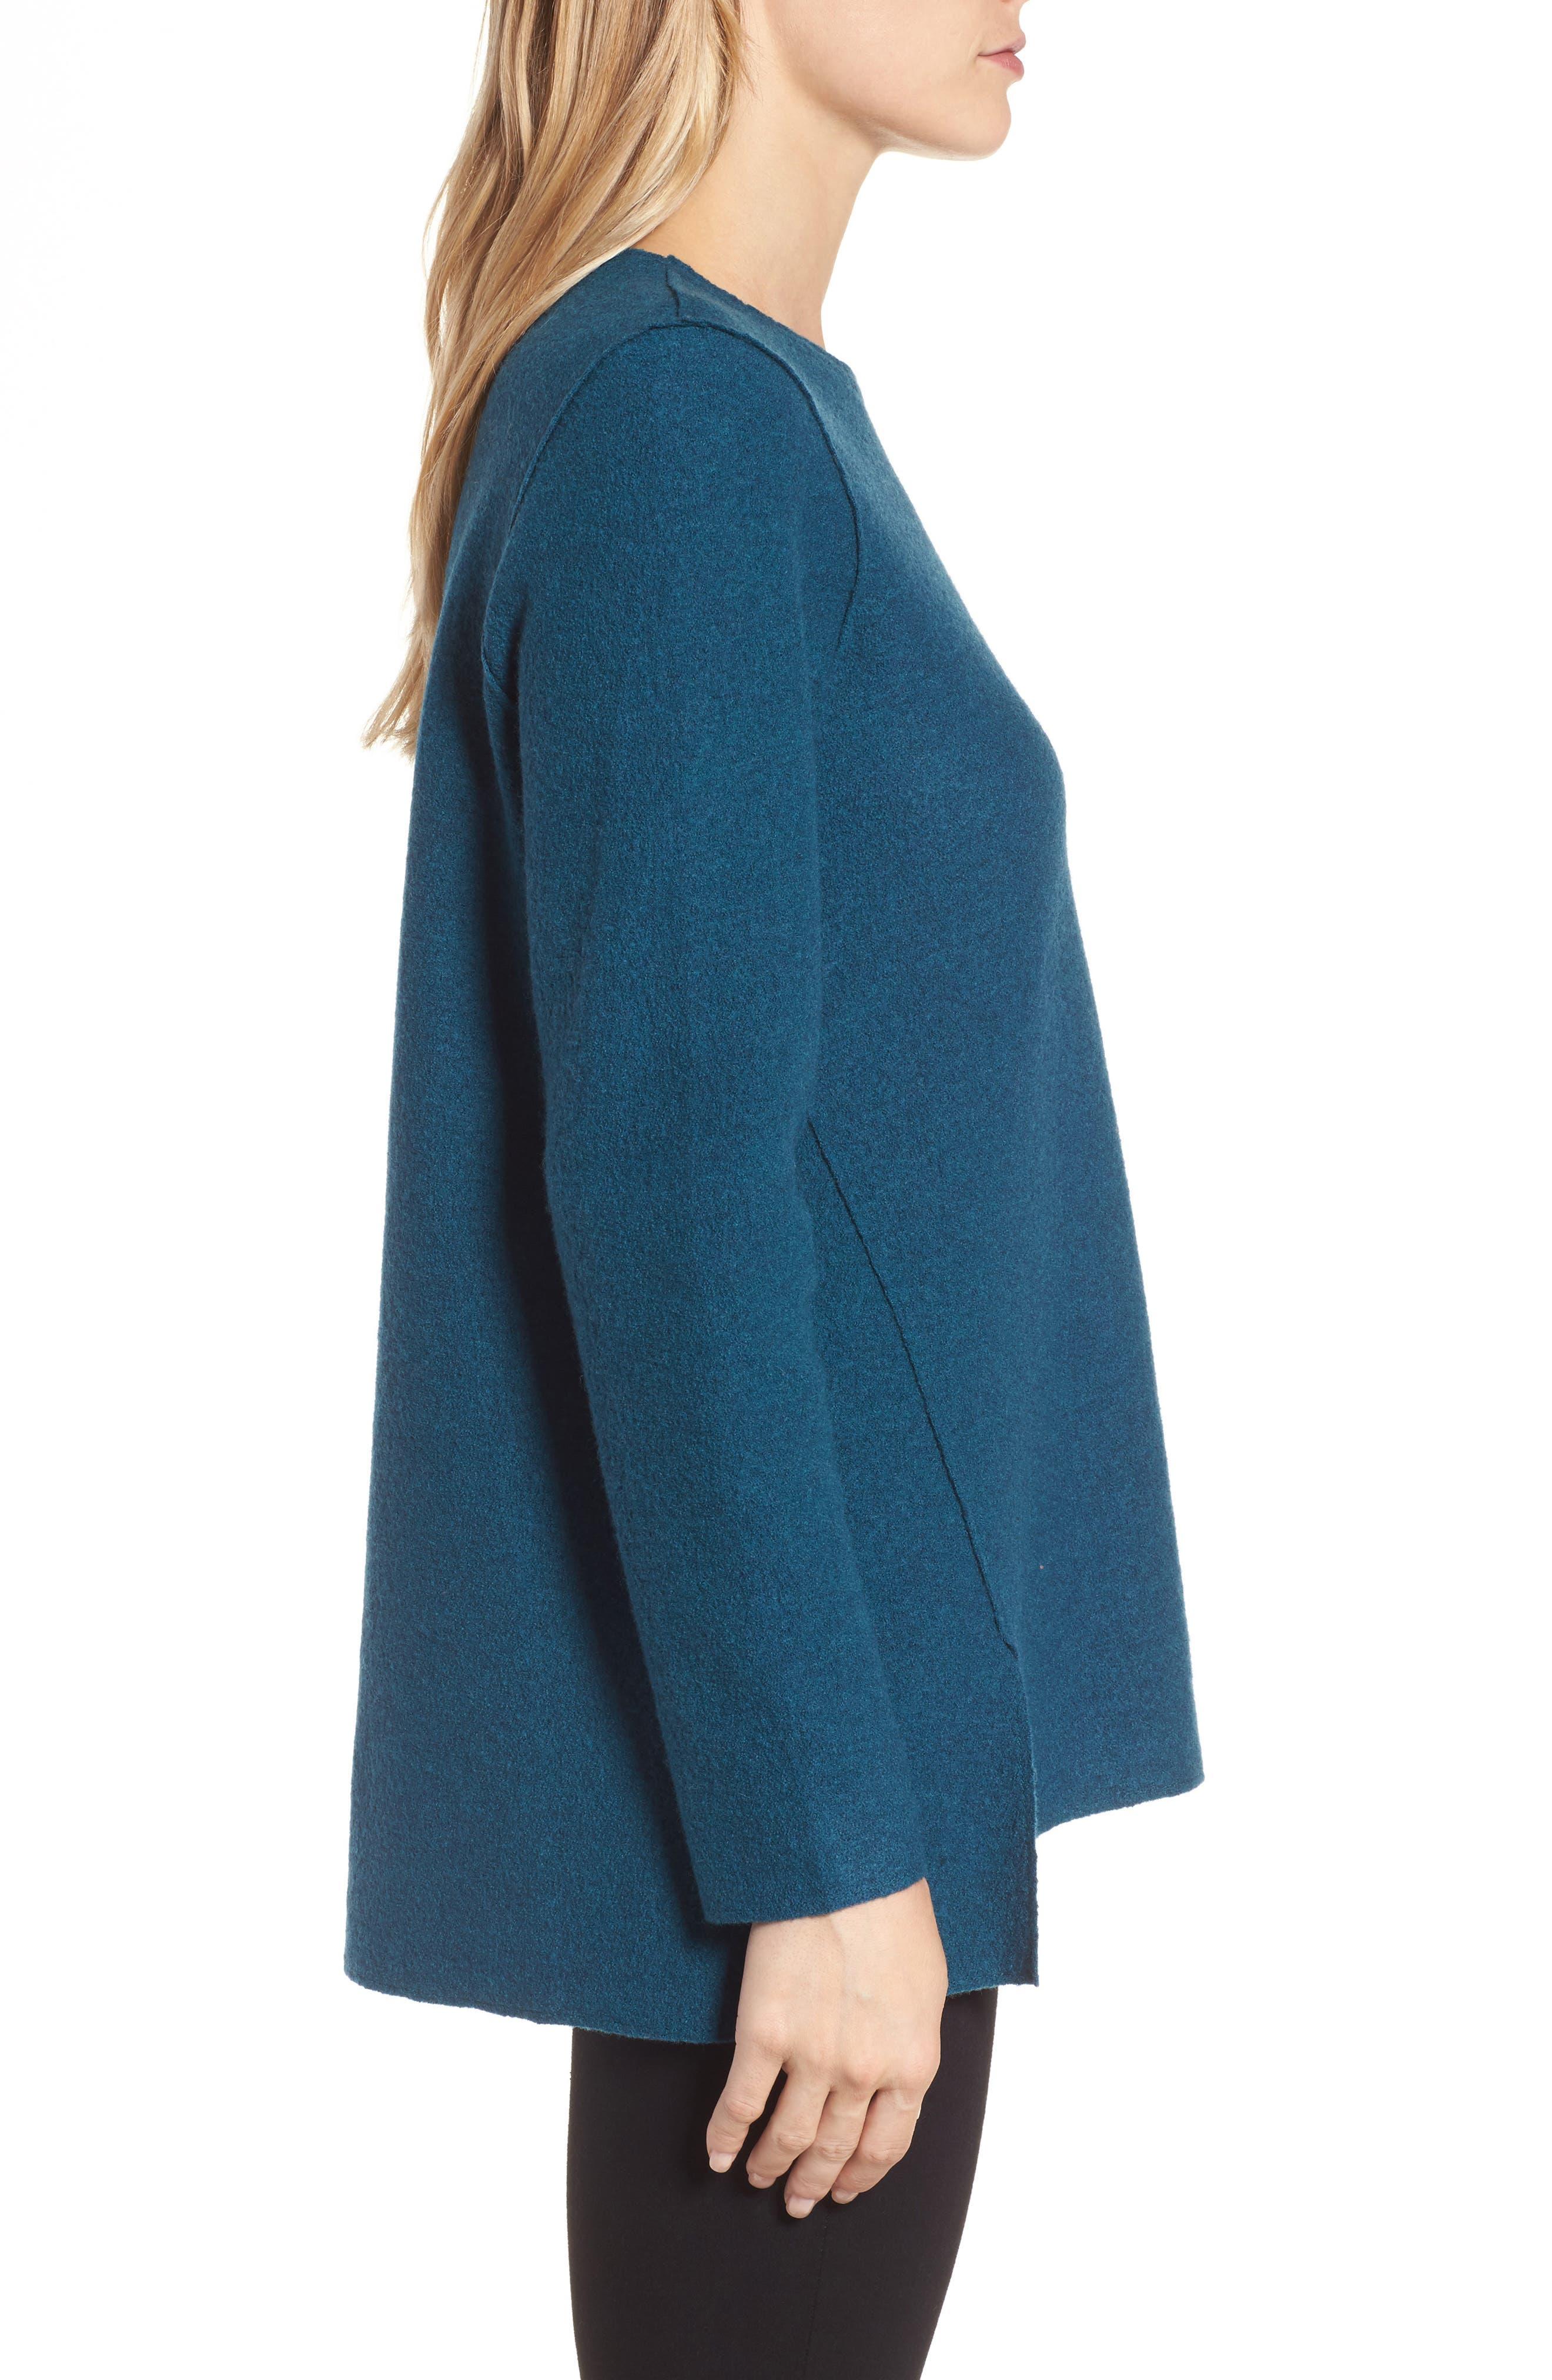 Boiled Merino Wool Top,                             Alternate thumbnail 3, color,                             Blue Spruce